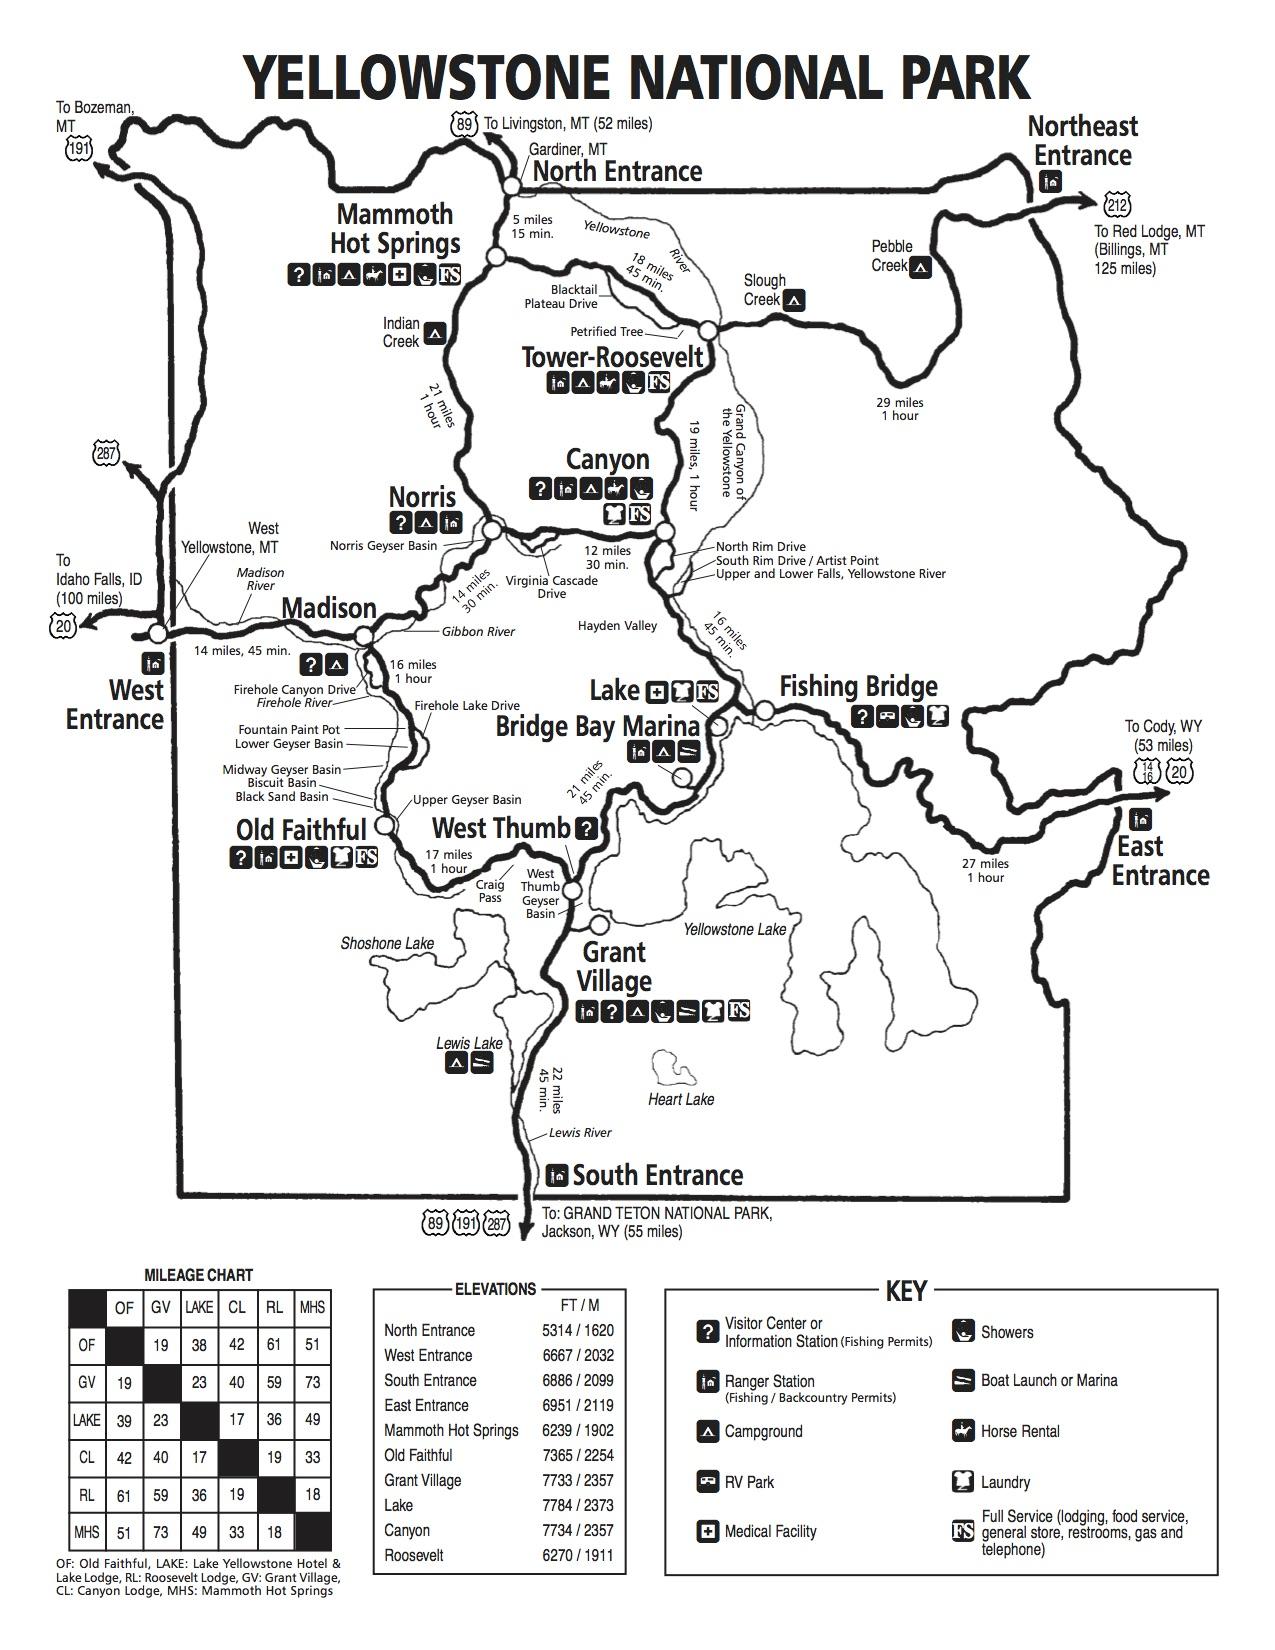 National Parks Usa Map | Wiring Diagram Database on bad boy parts diagram, bad boy controller diagram, bad boy accessories, lawn boy wiring diagram, bad boy horn diagram,